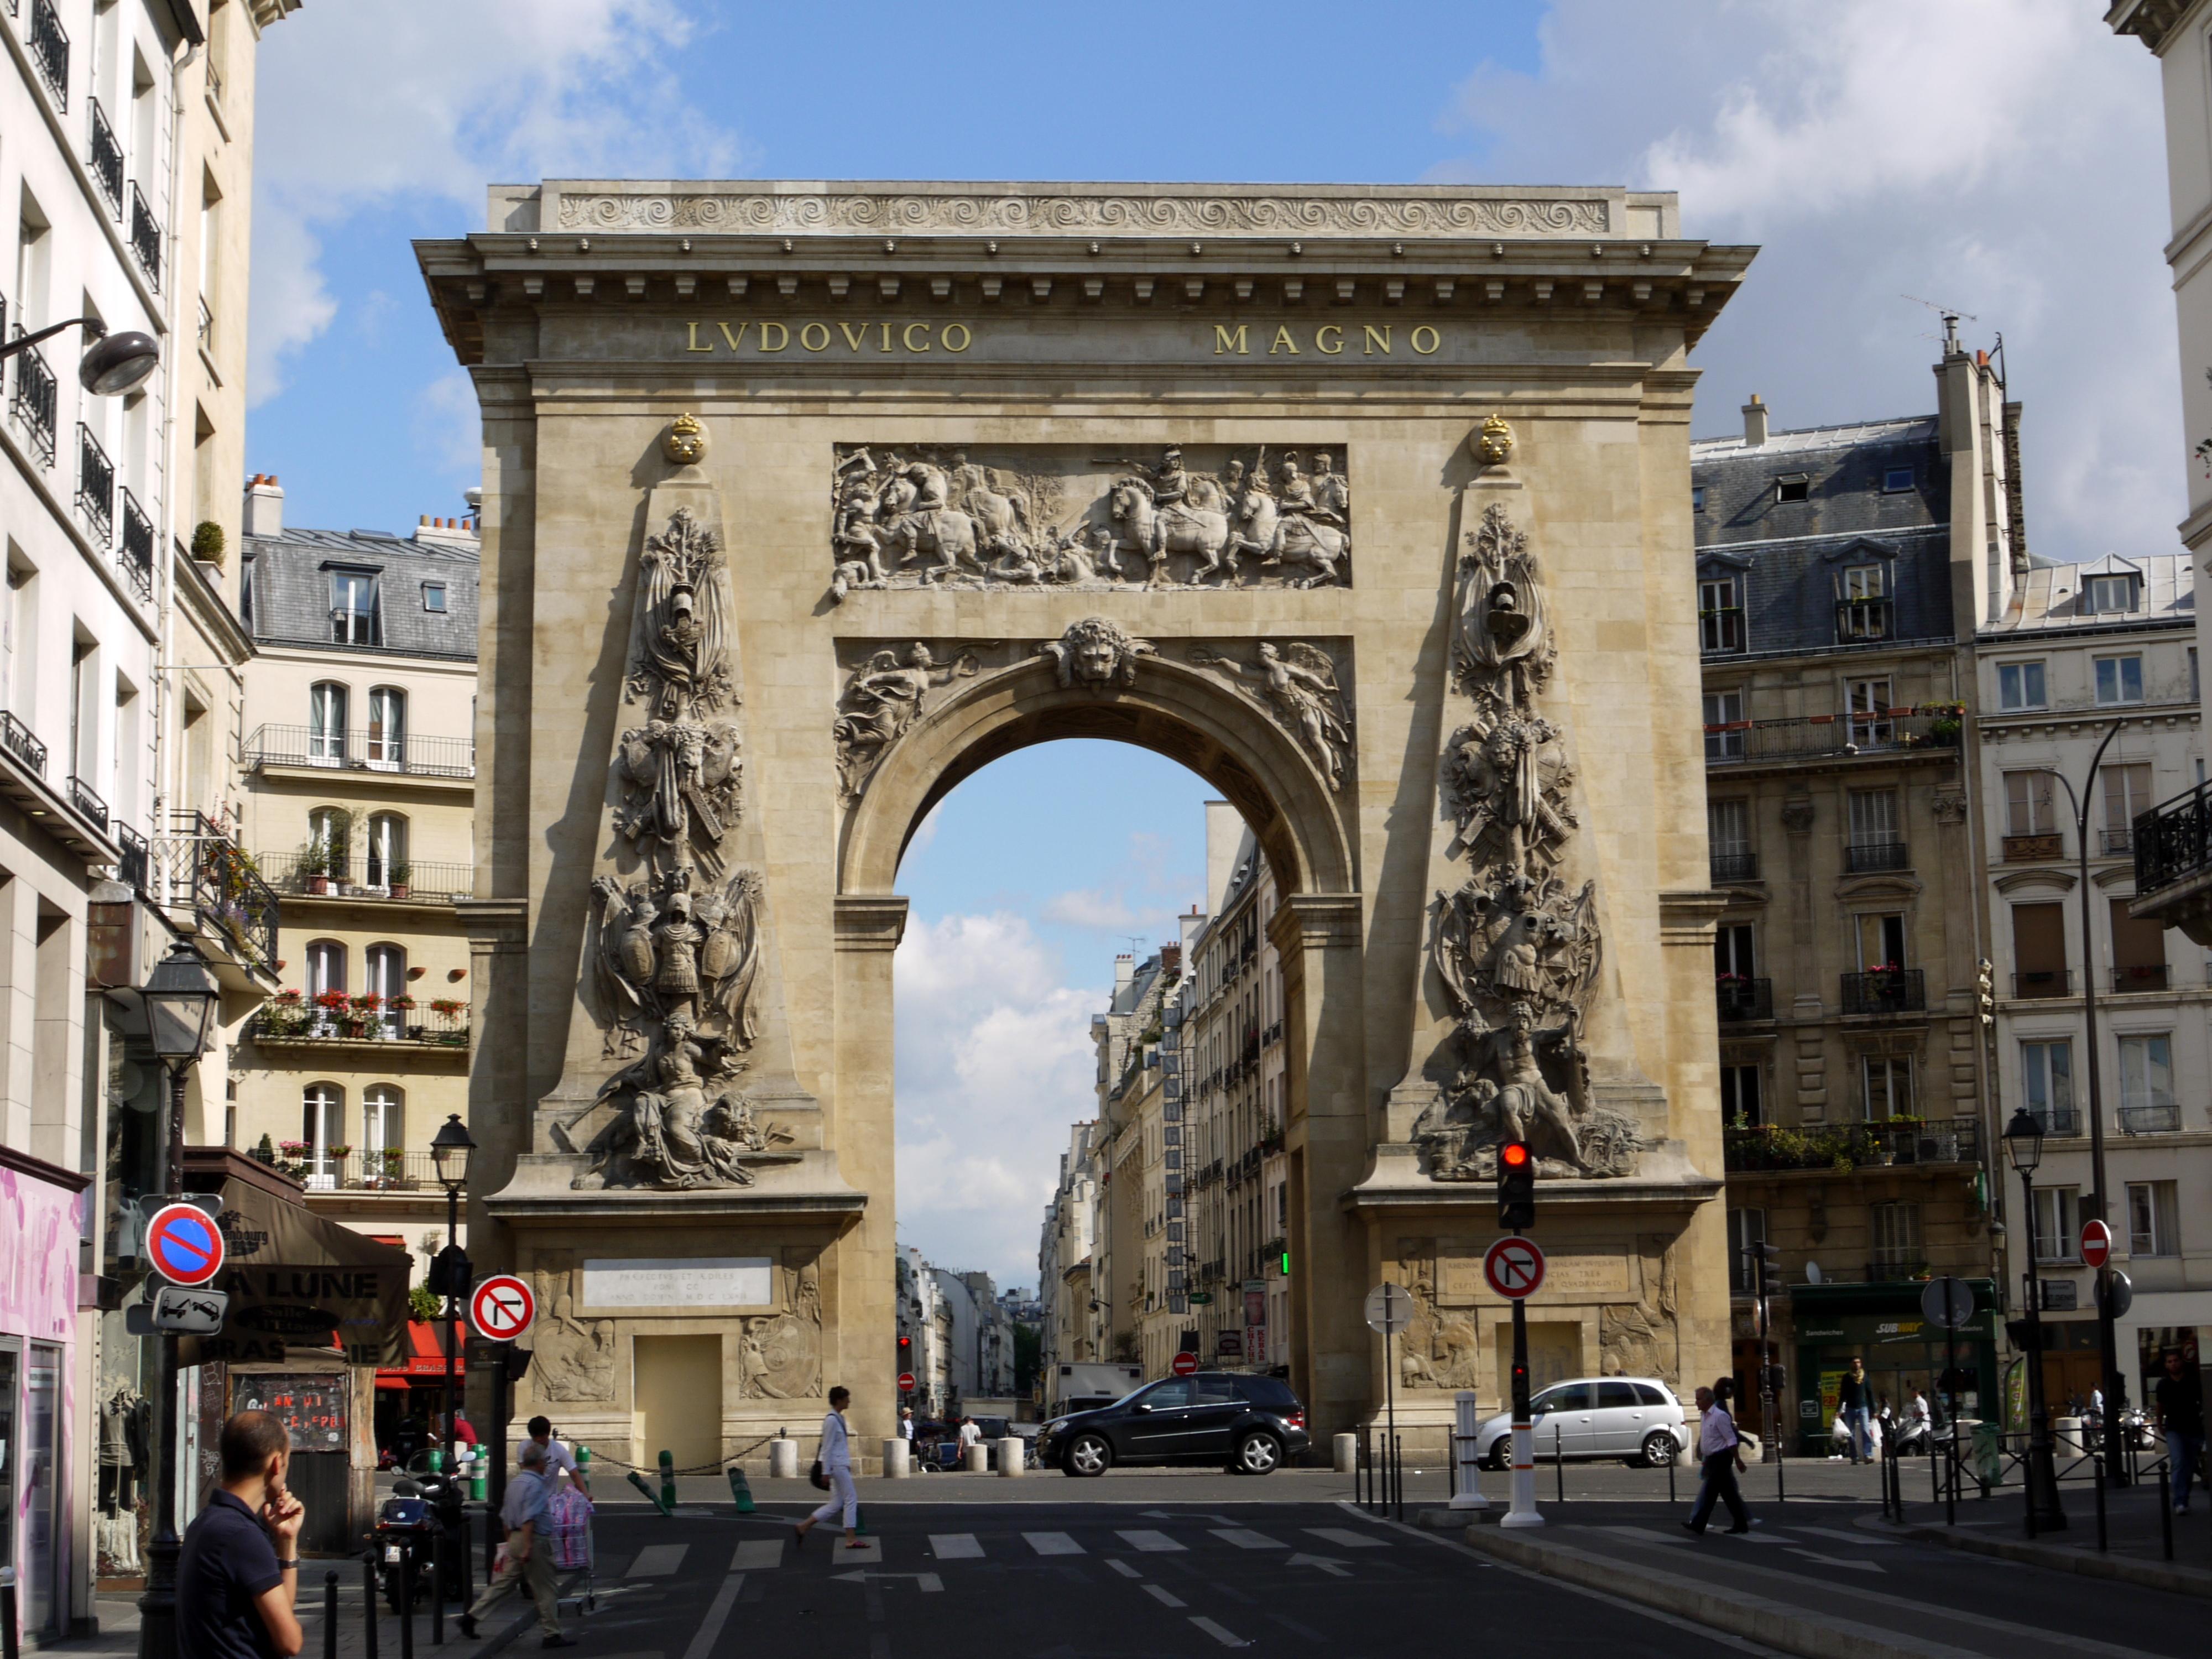 Thtre de la porte saint martin reves365 com for Porte saint martin